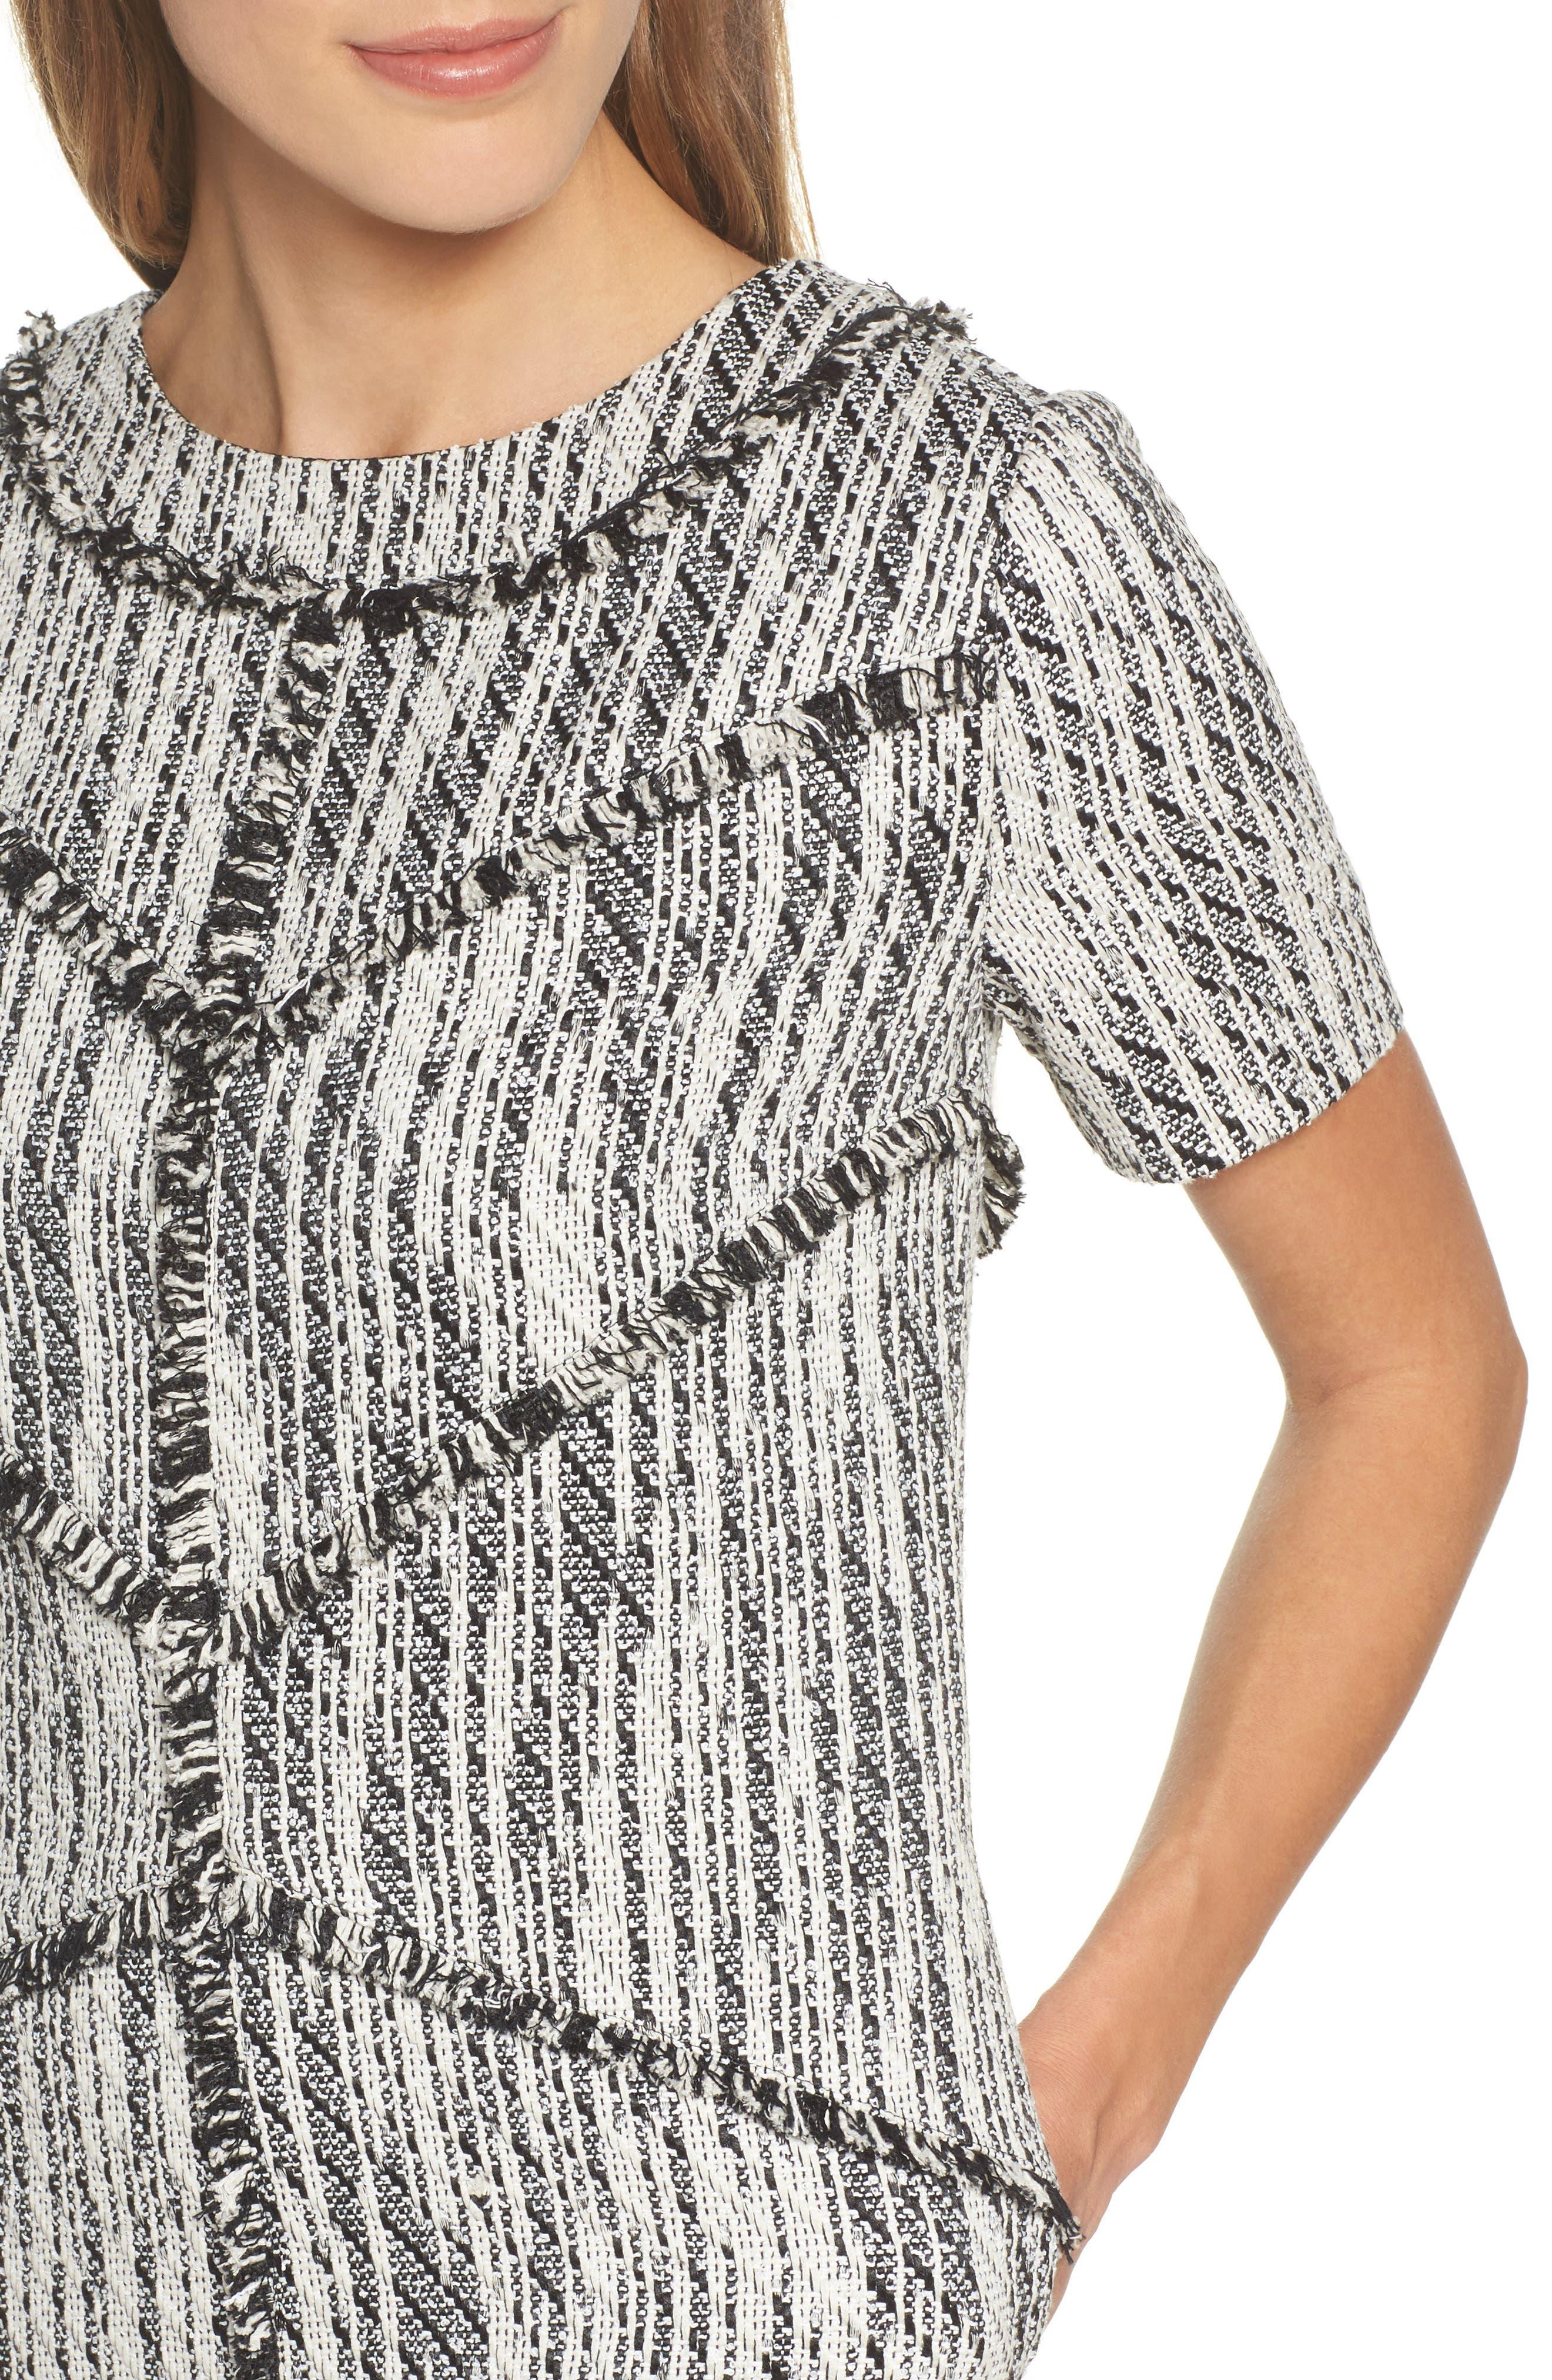 Dolce Vita Tweed Shift Dress,                             Alternate thumbnail 5, color,                             Black/ Ivory Tweed